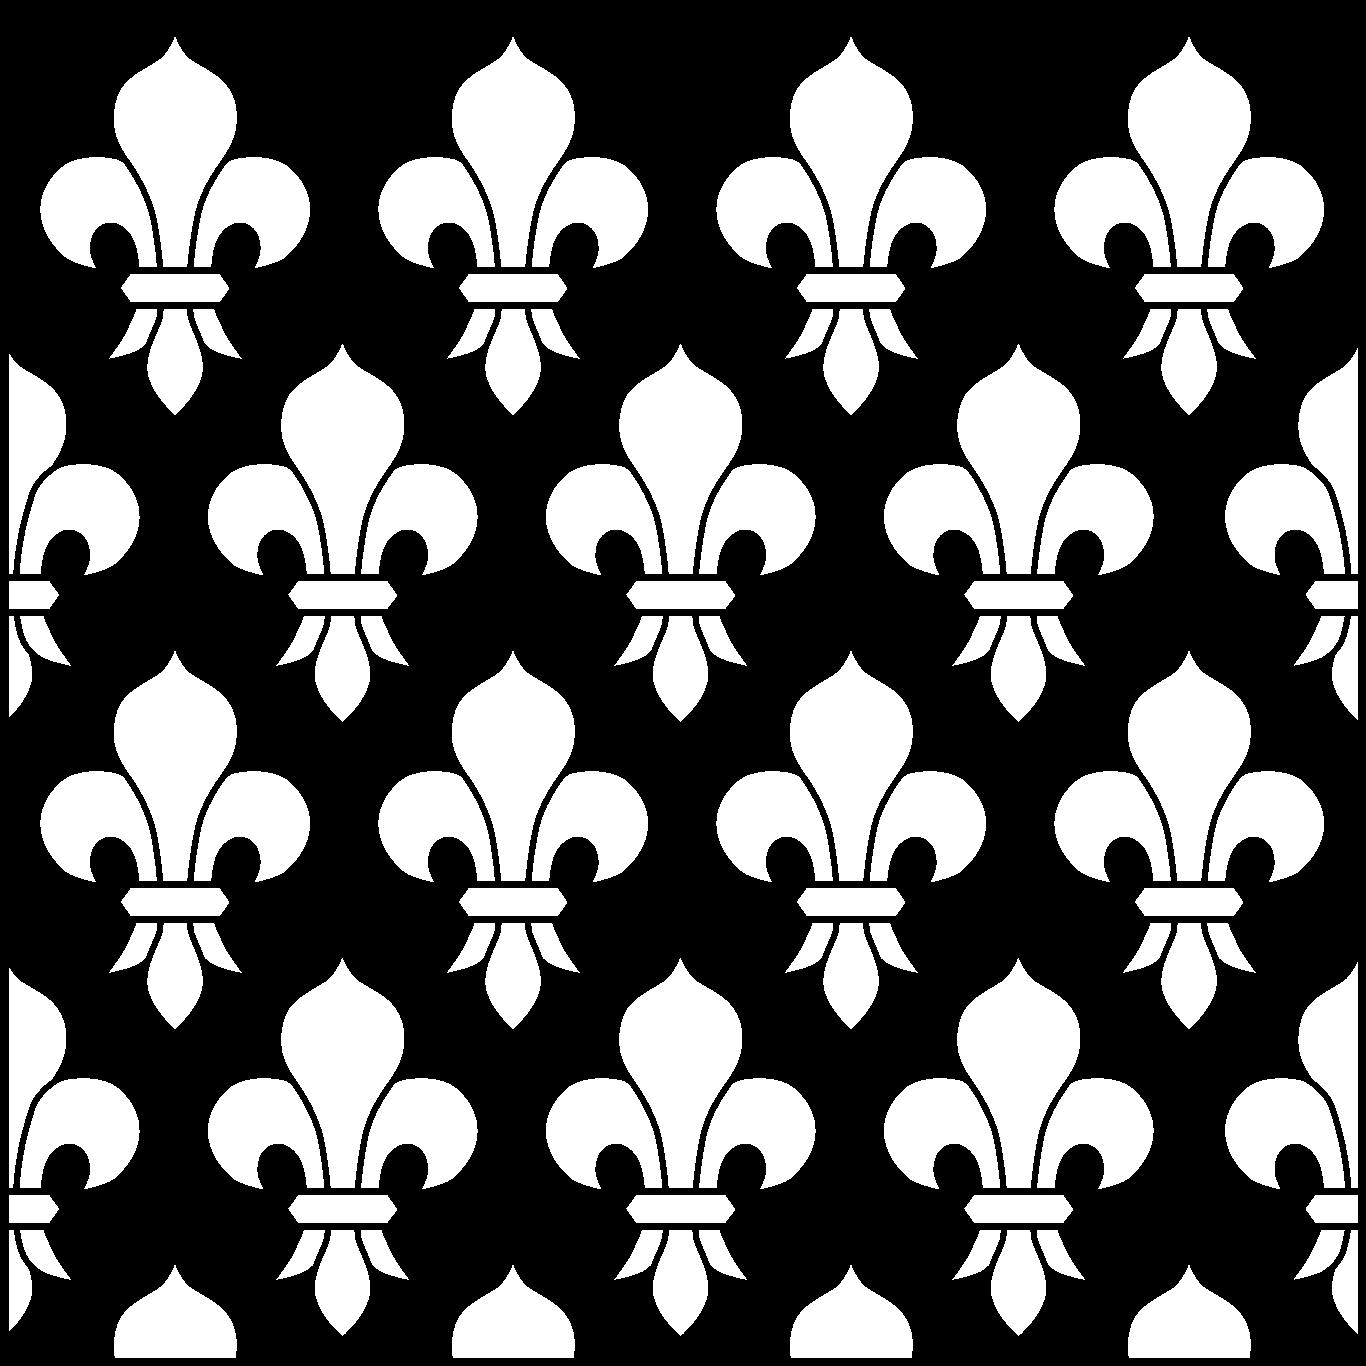 Semy Traceable Heraldic Art